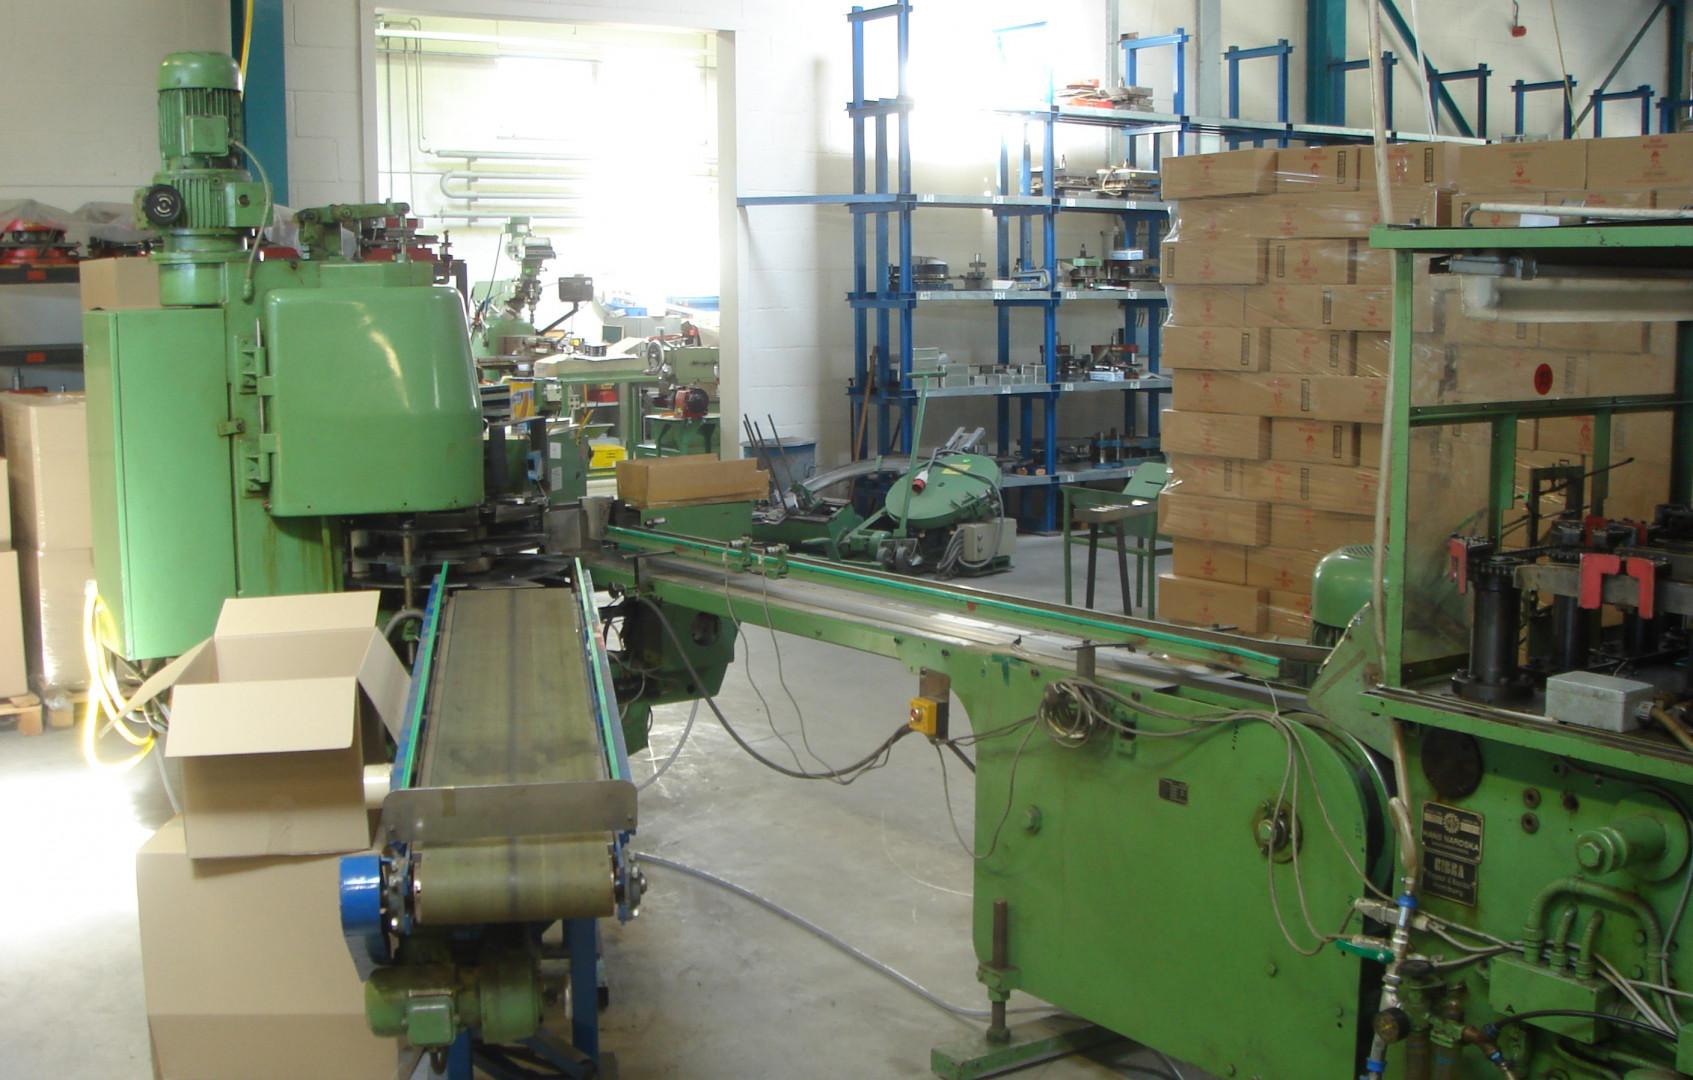 Lubeca LW 303 automatic seamer - output conveyor